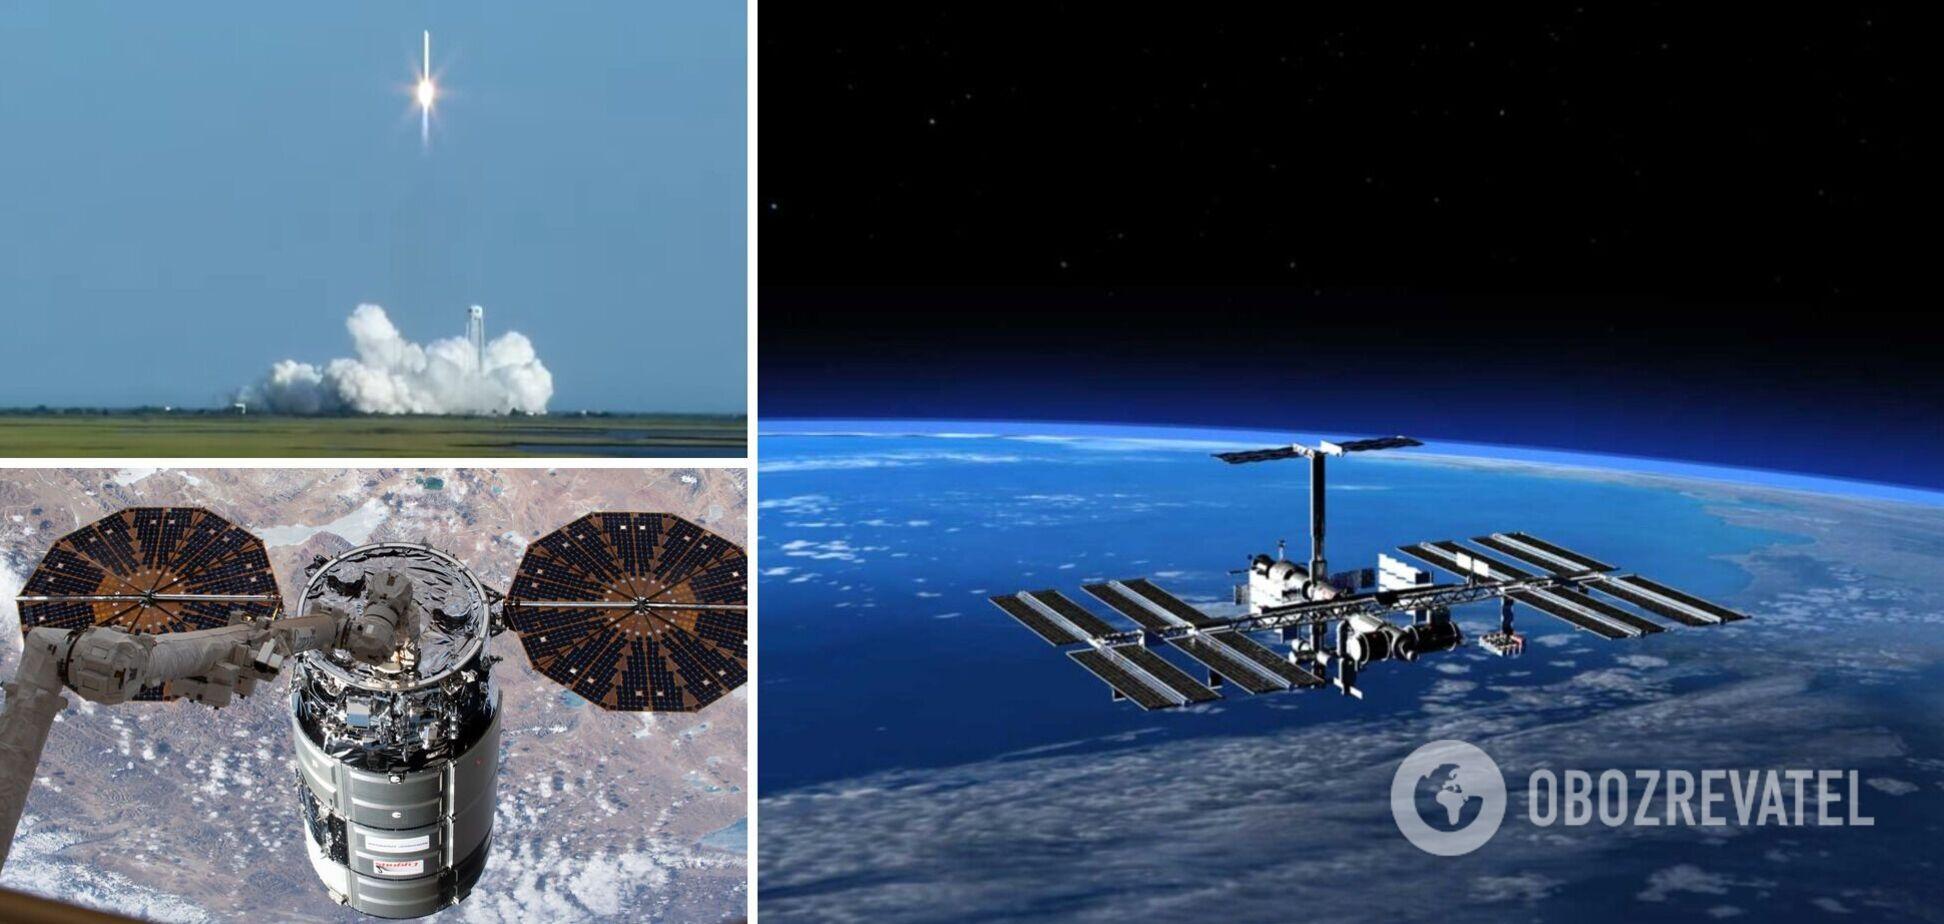 NASA запустило в космос українсько-американську ракету Antares: який вантаж доставлять на МКС. Відео